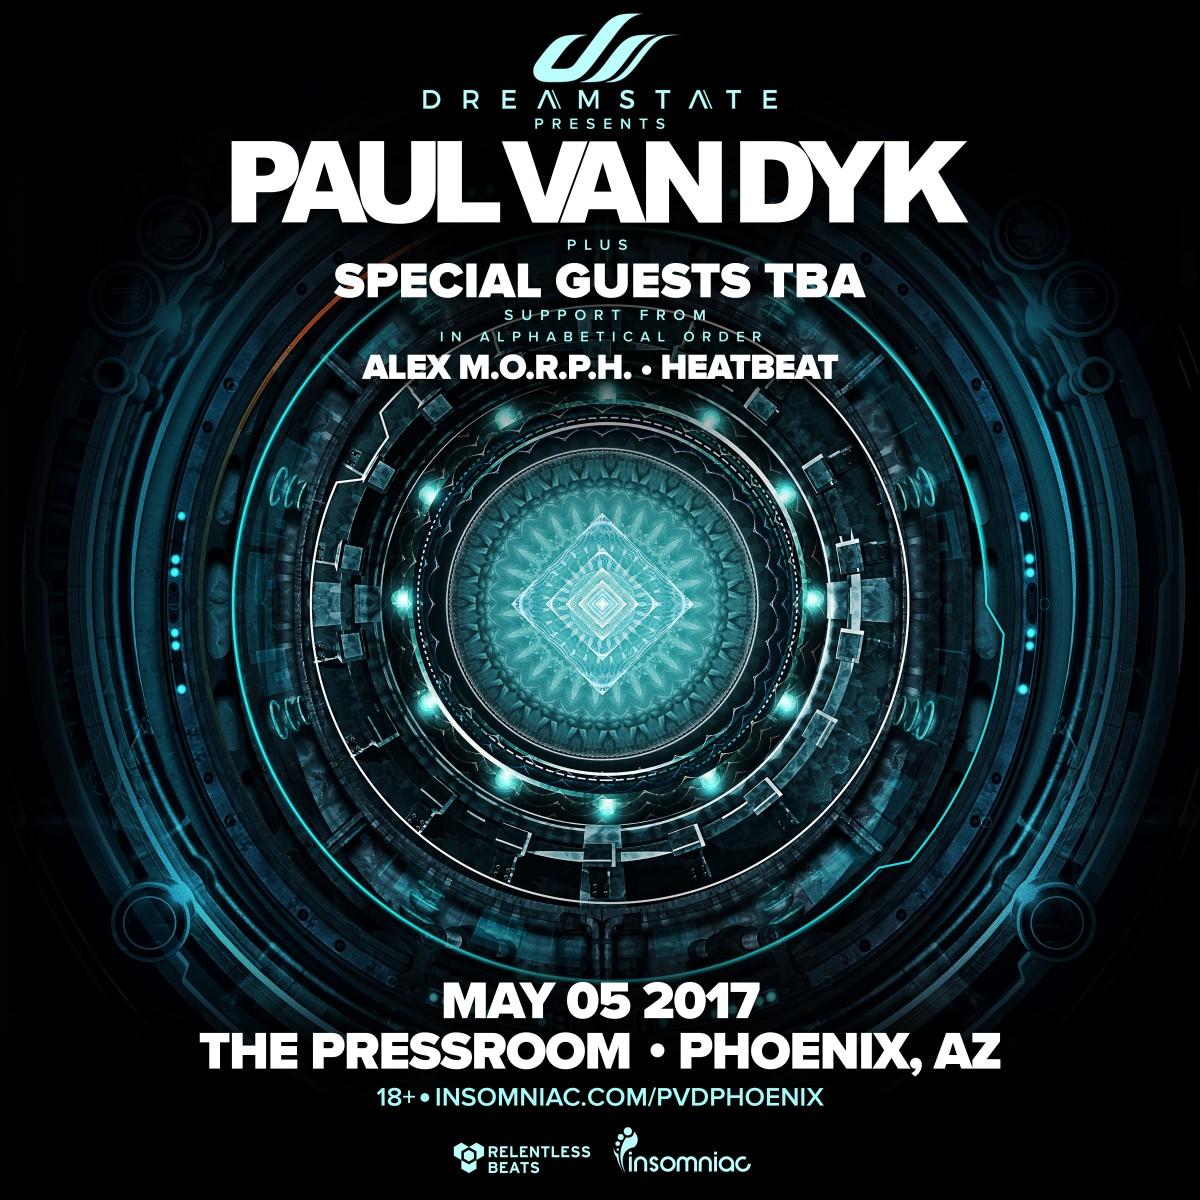 Flyer for Dreamstate presents: Paul van Dyk in Phoenix